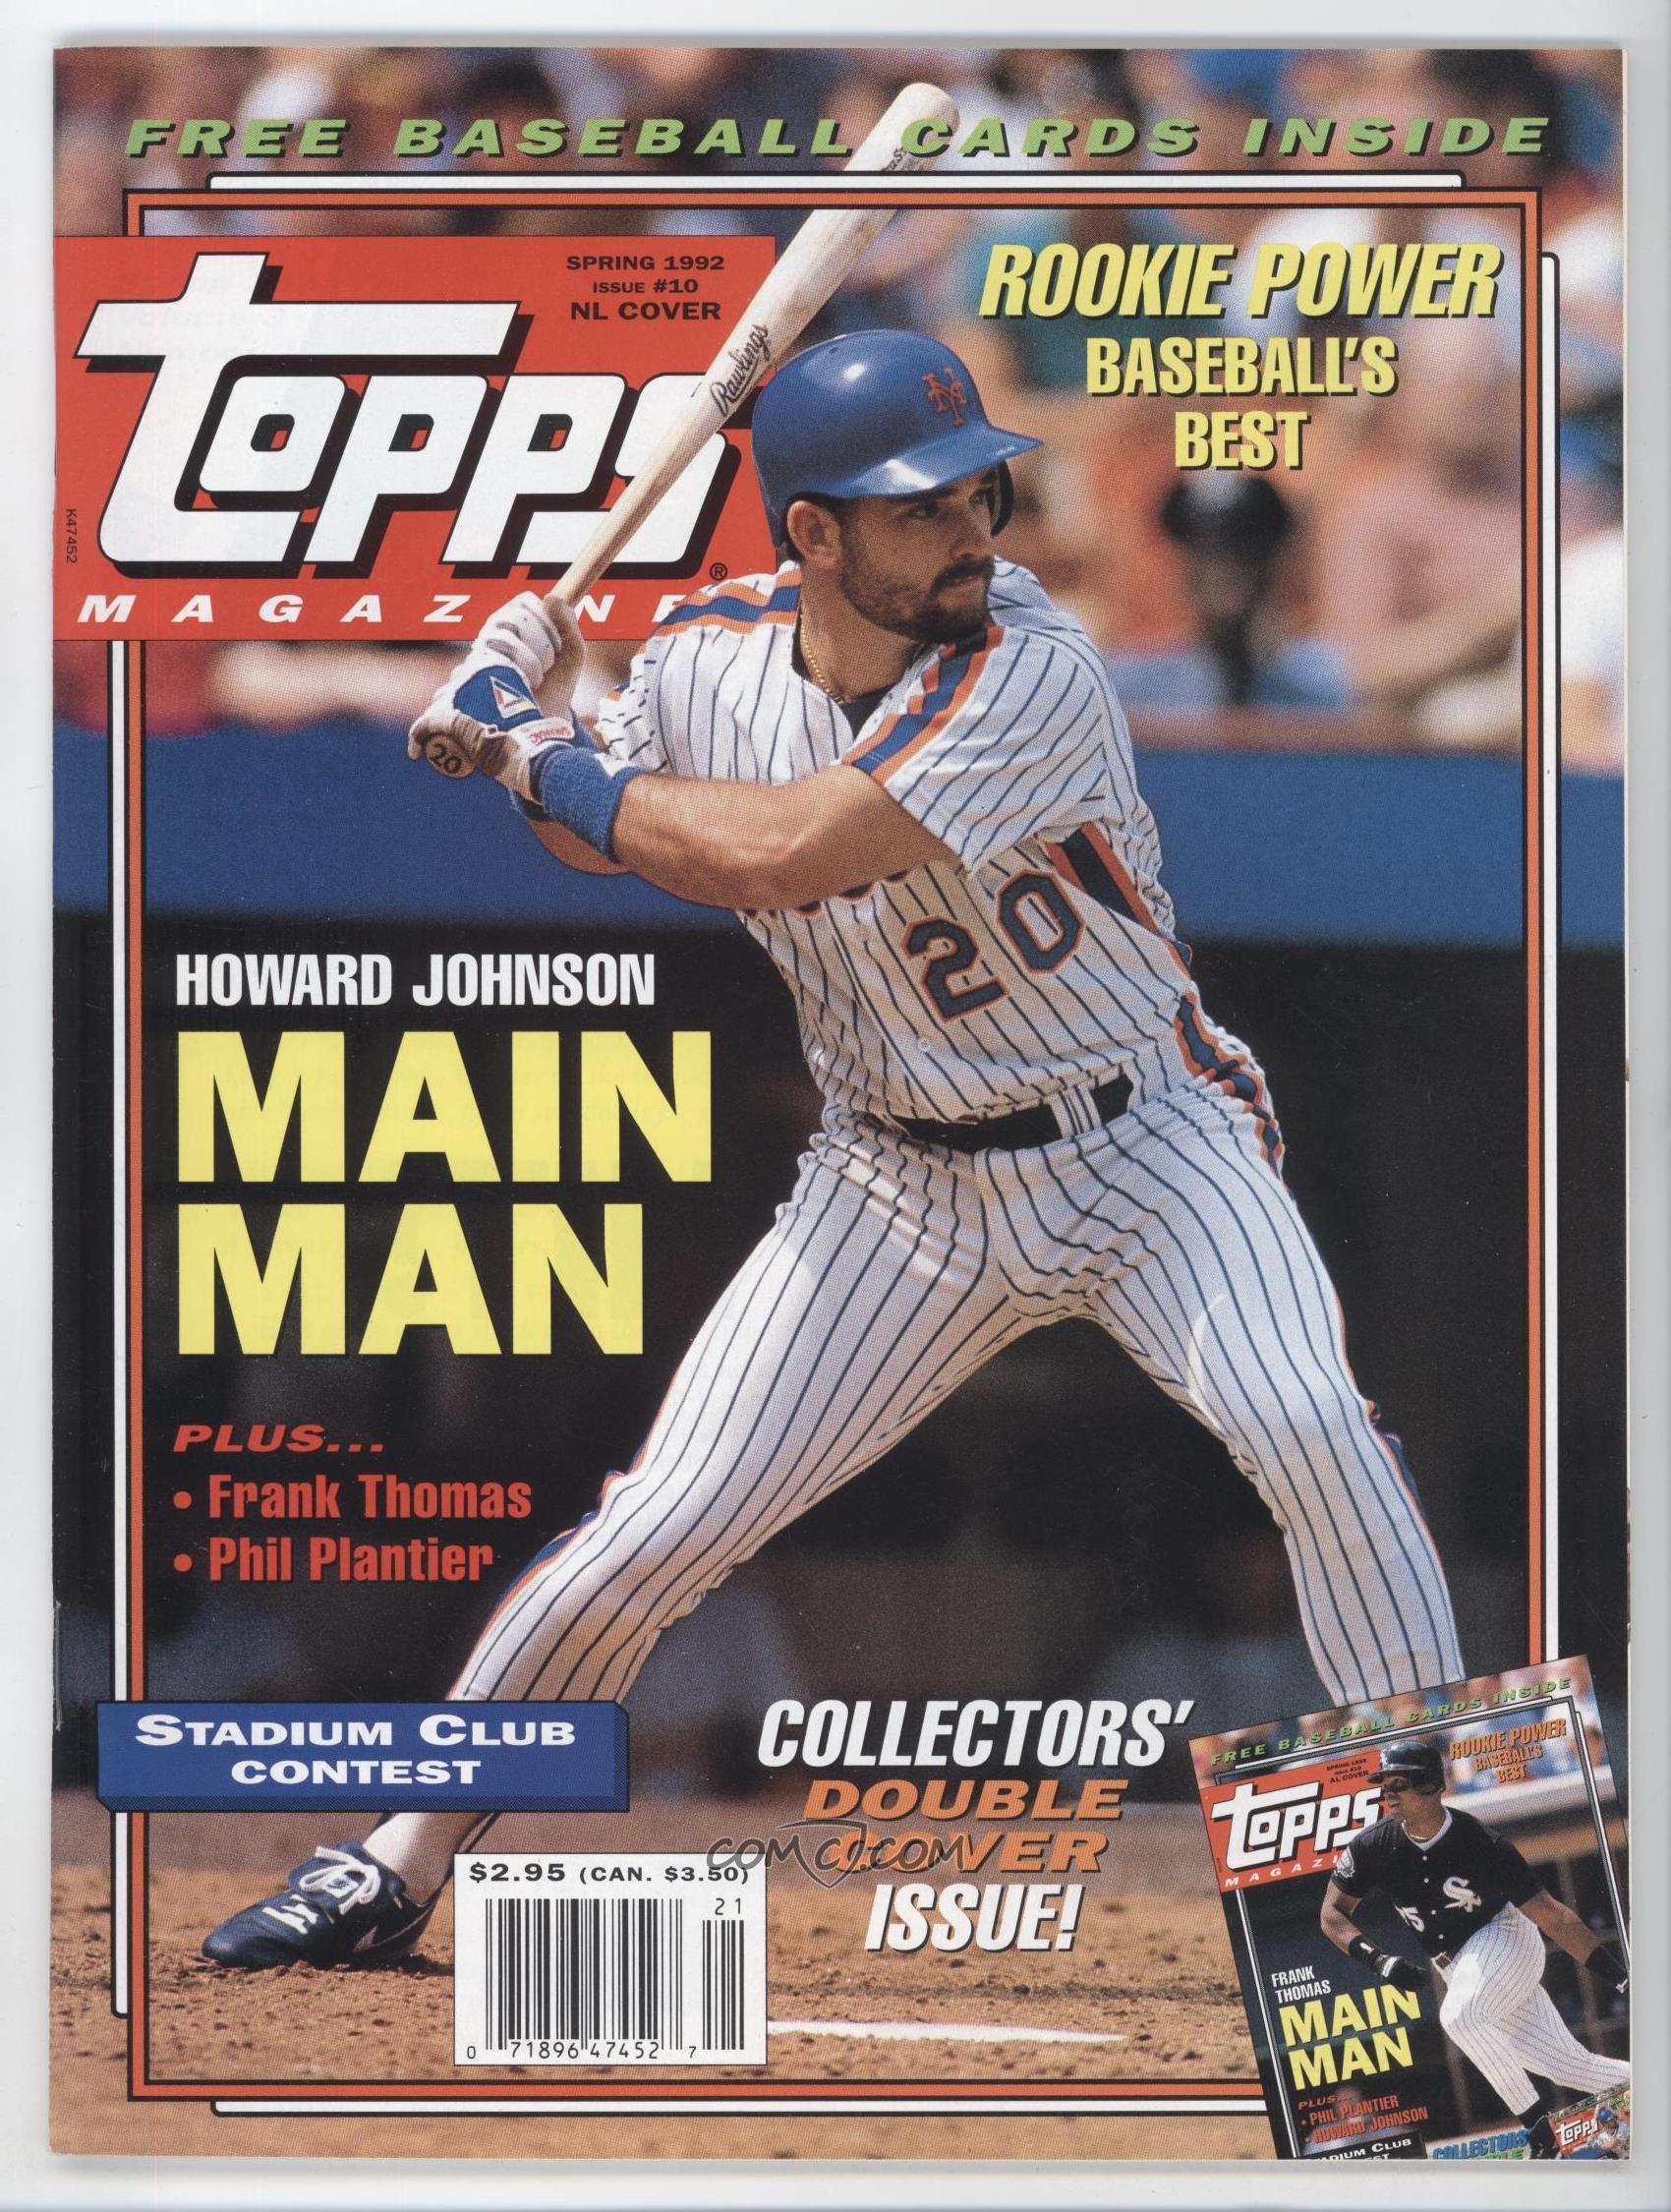 1990 1993 Topps Magazine Base 102 Spring 1992